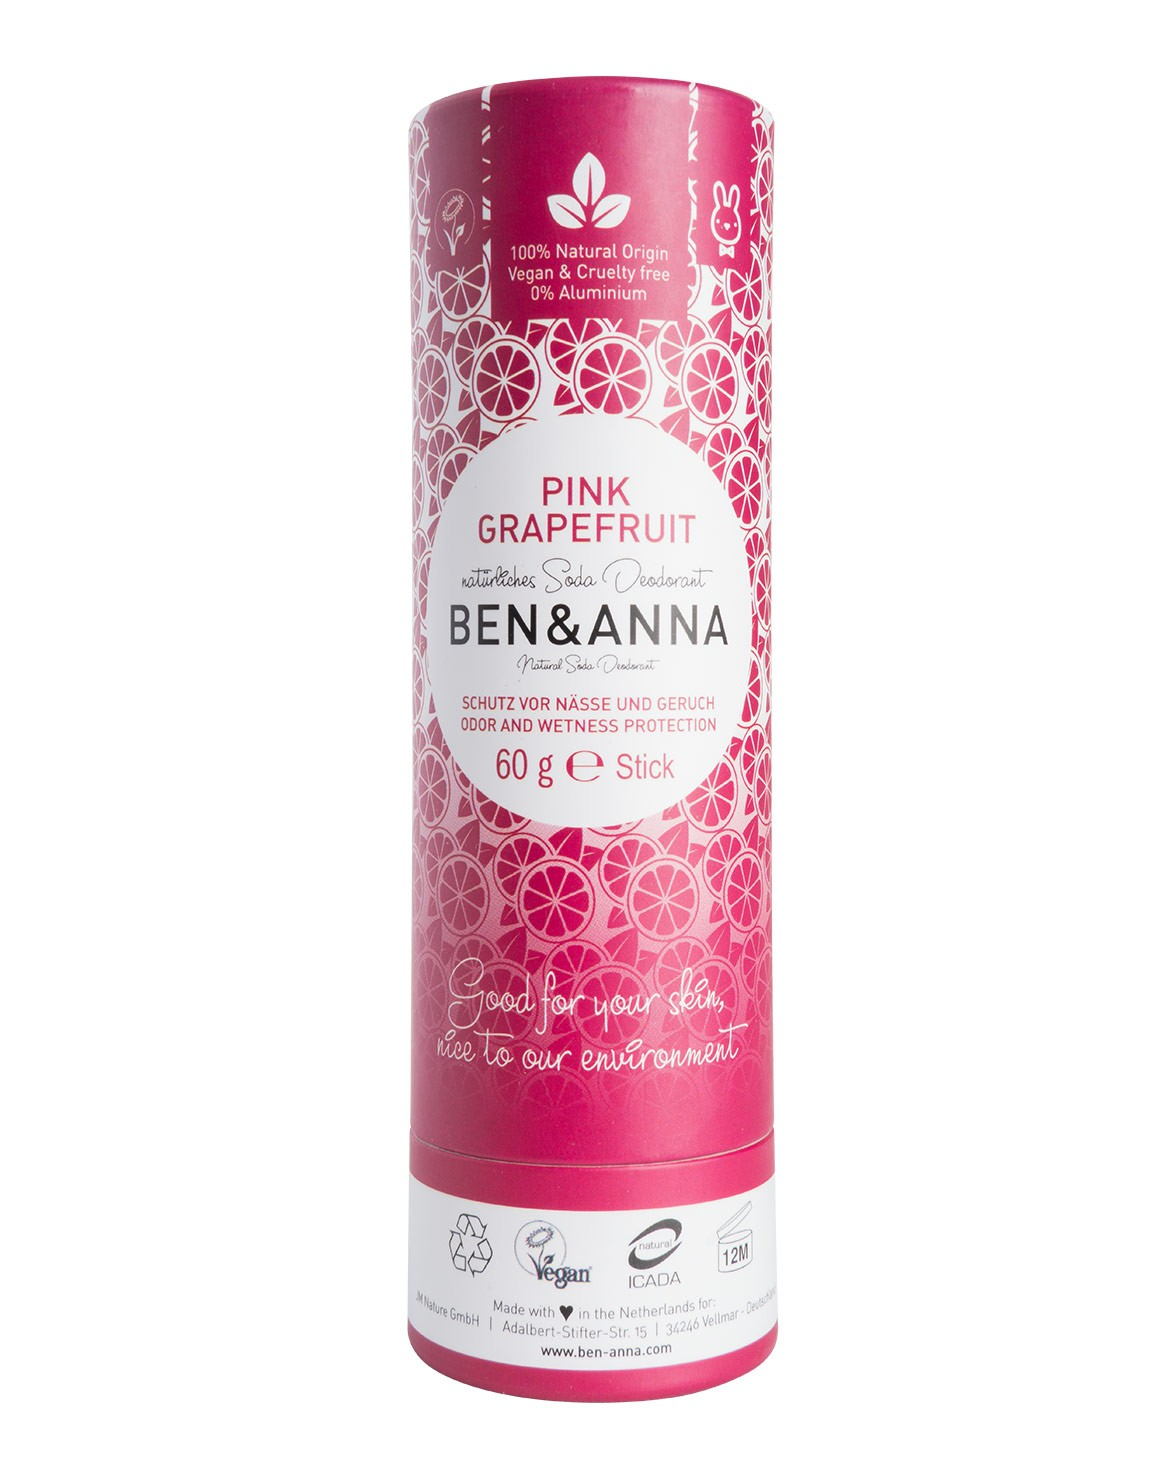 Pink Grapefruit Deodorant